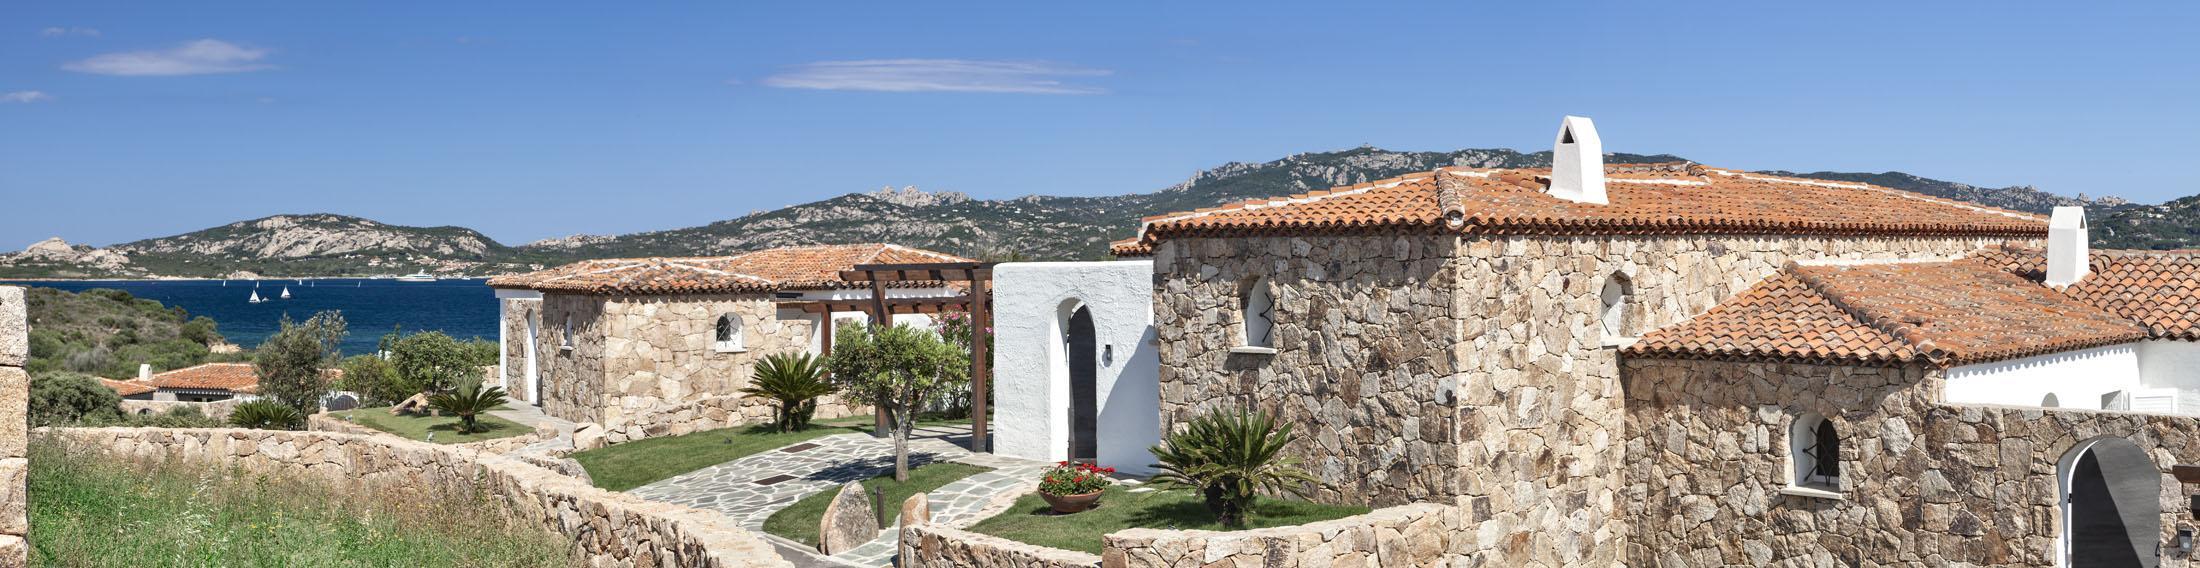 Beautiful Seafront Villa luxury homes